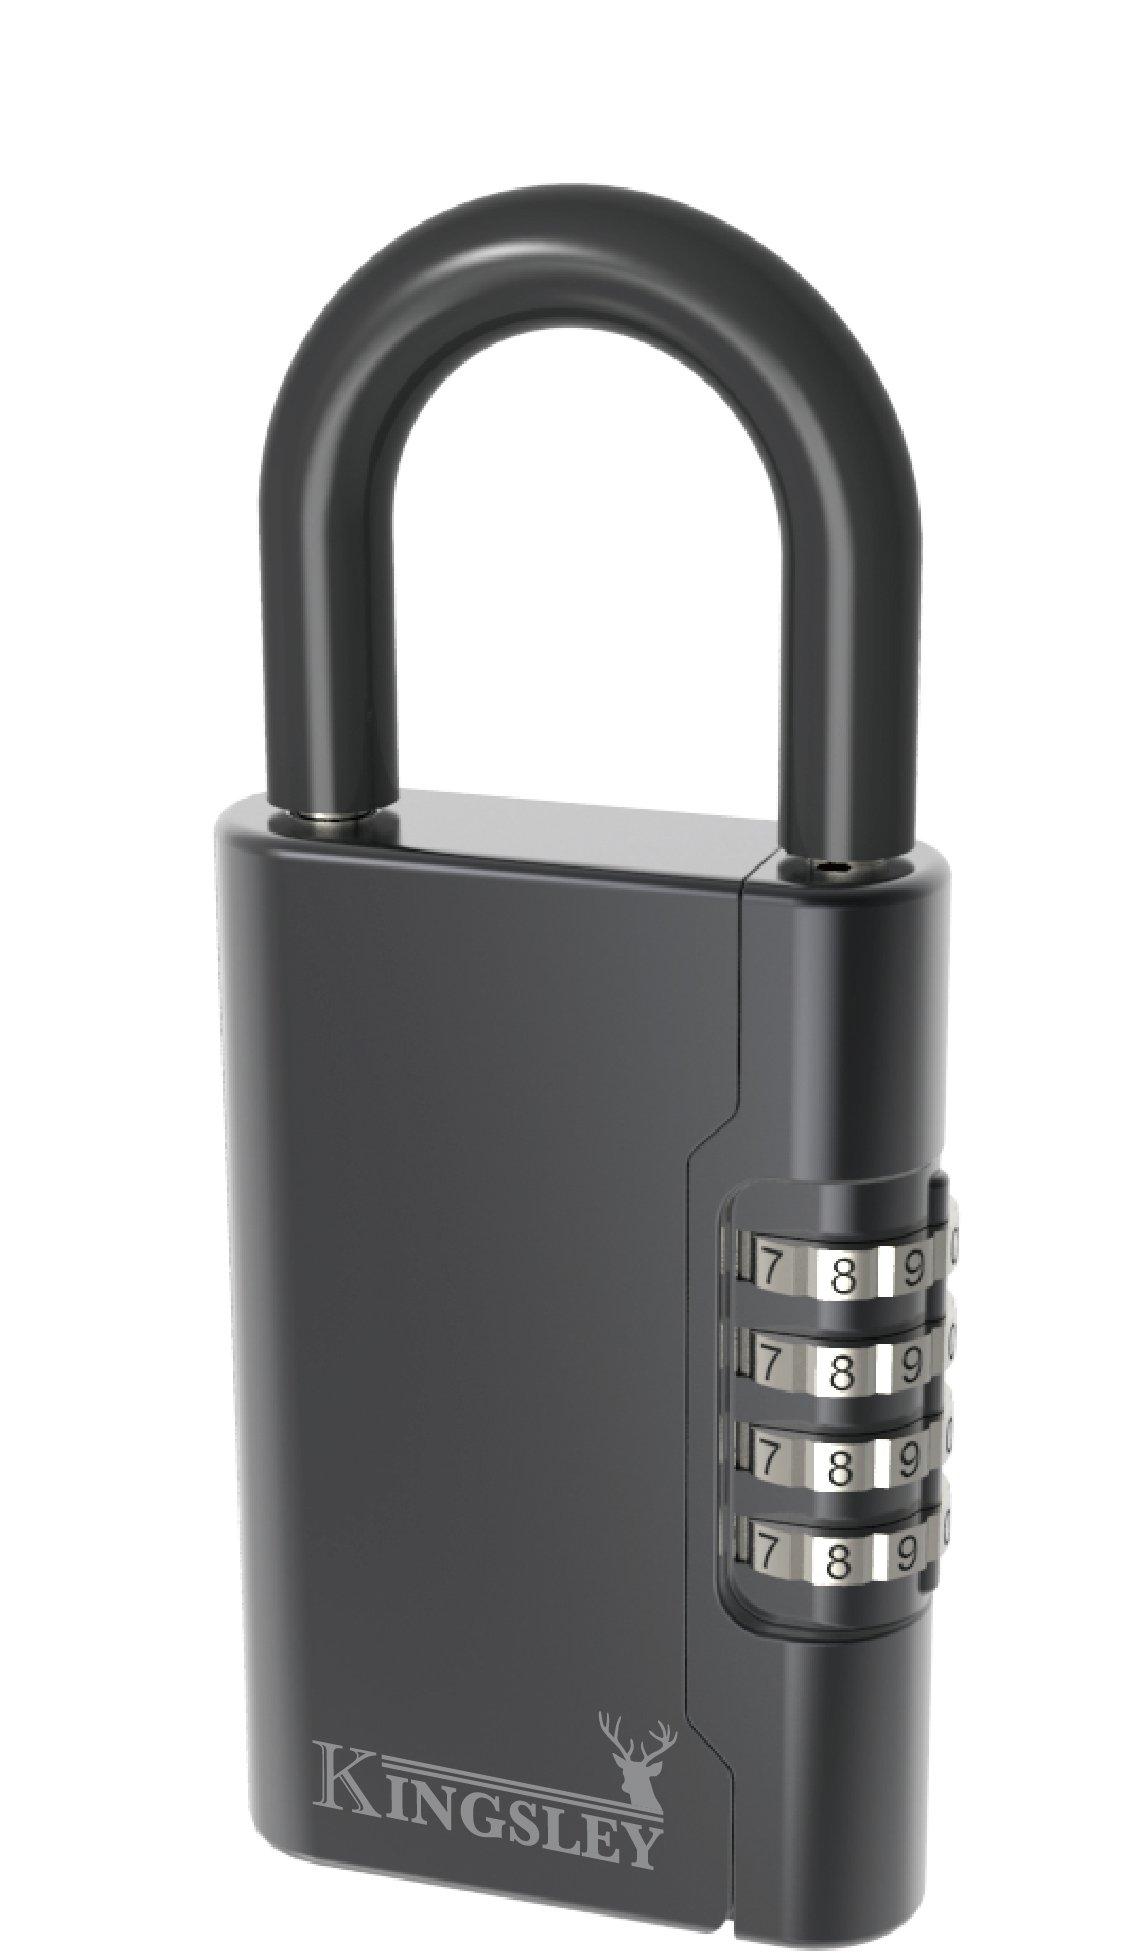 Kingsley Guard-a-key Black Realtor's Lockbox